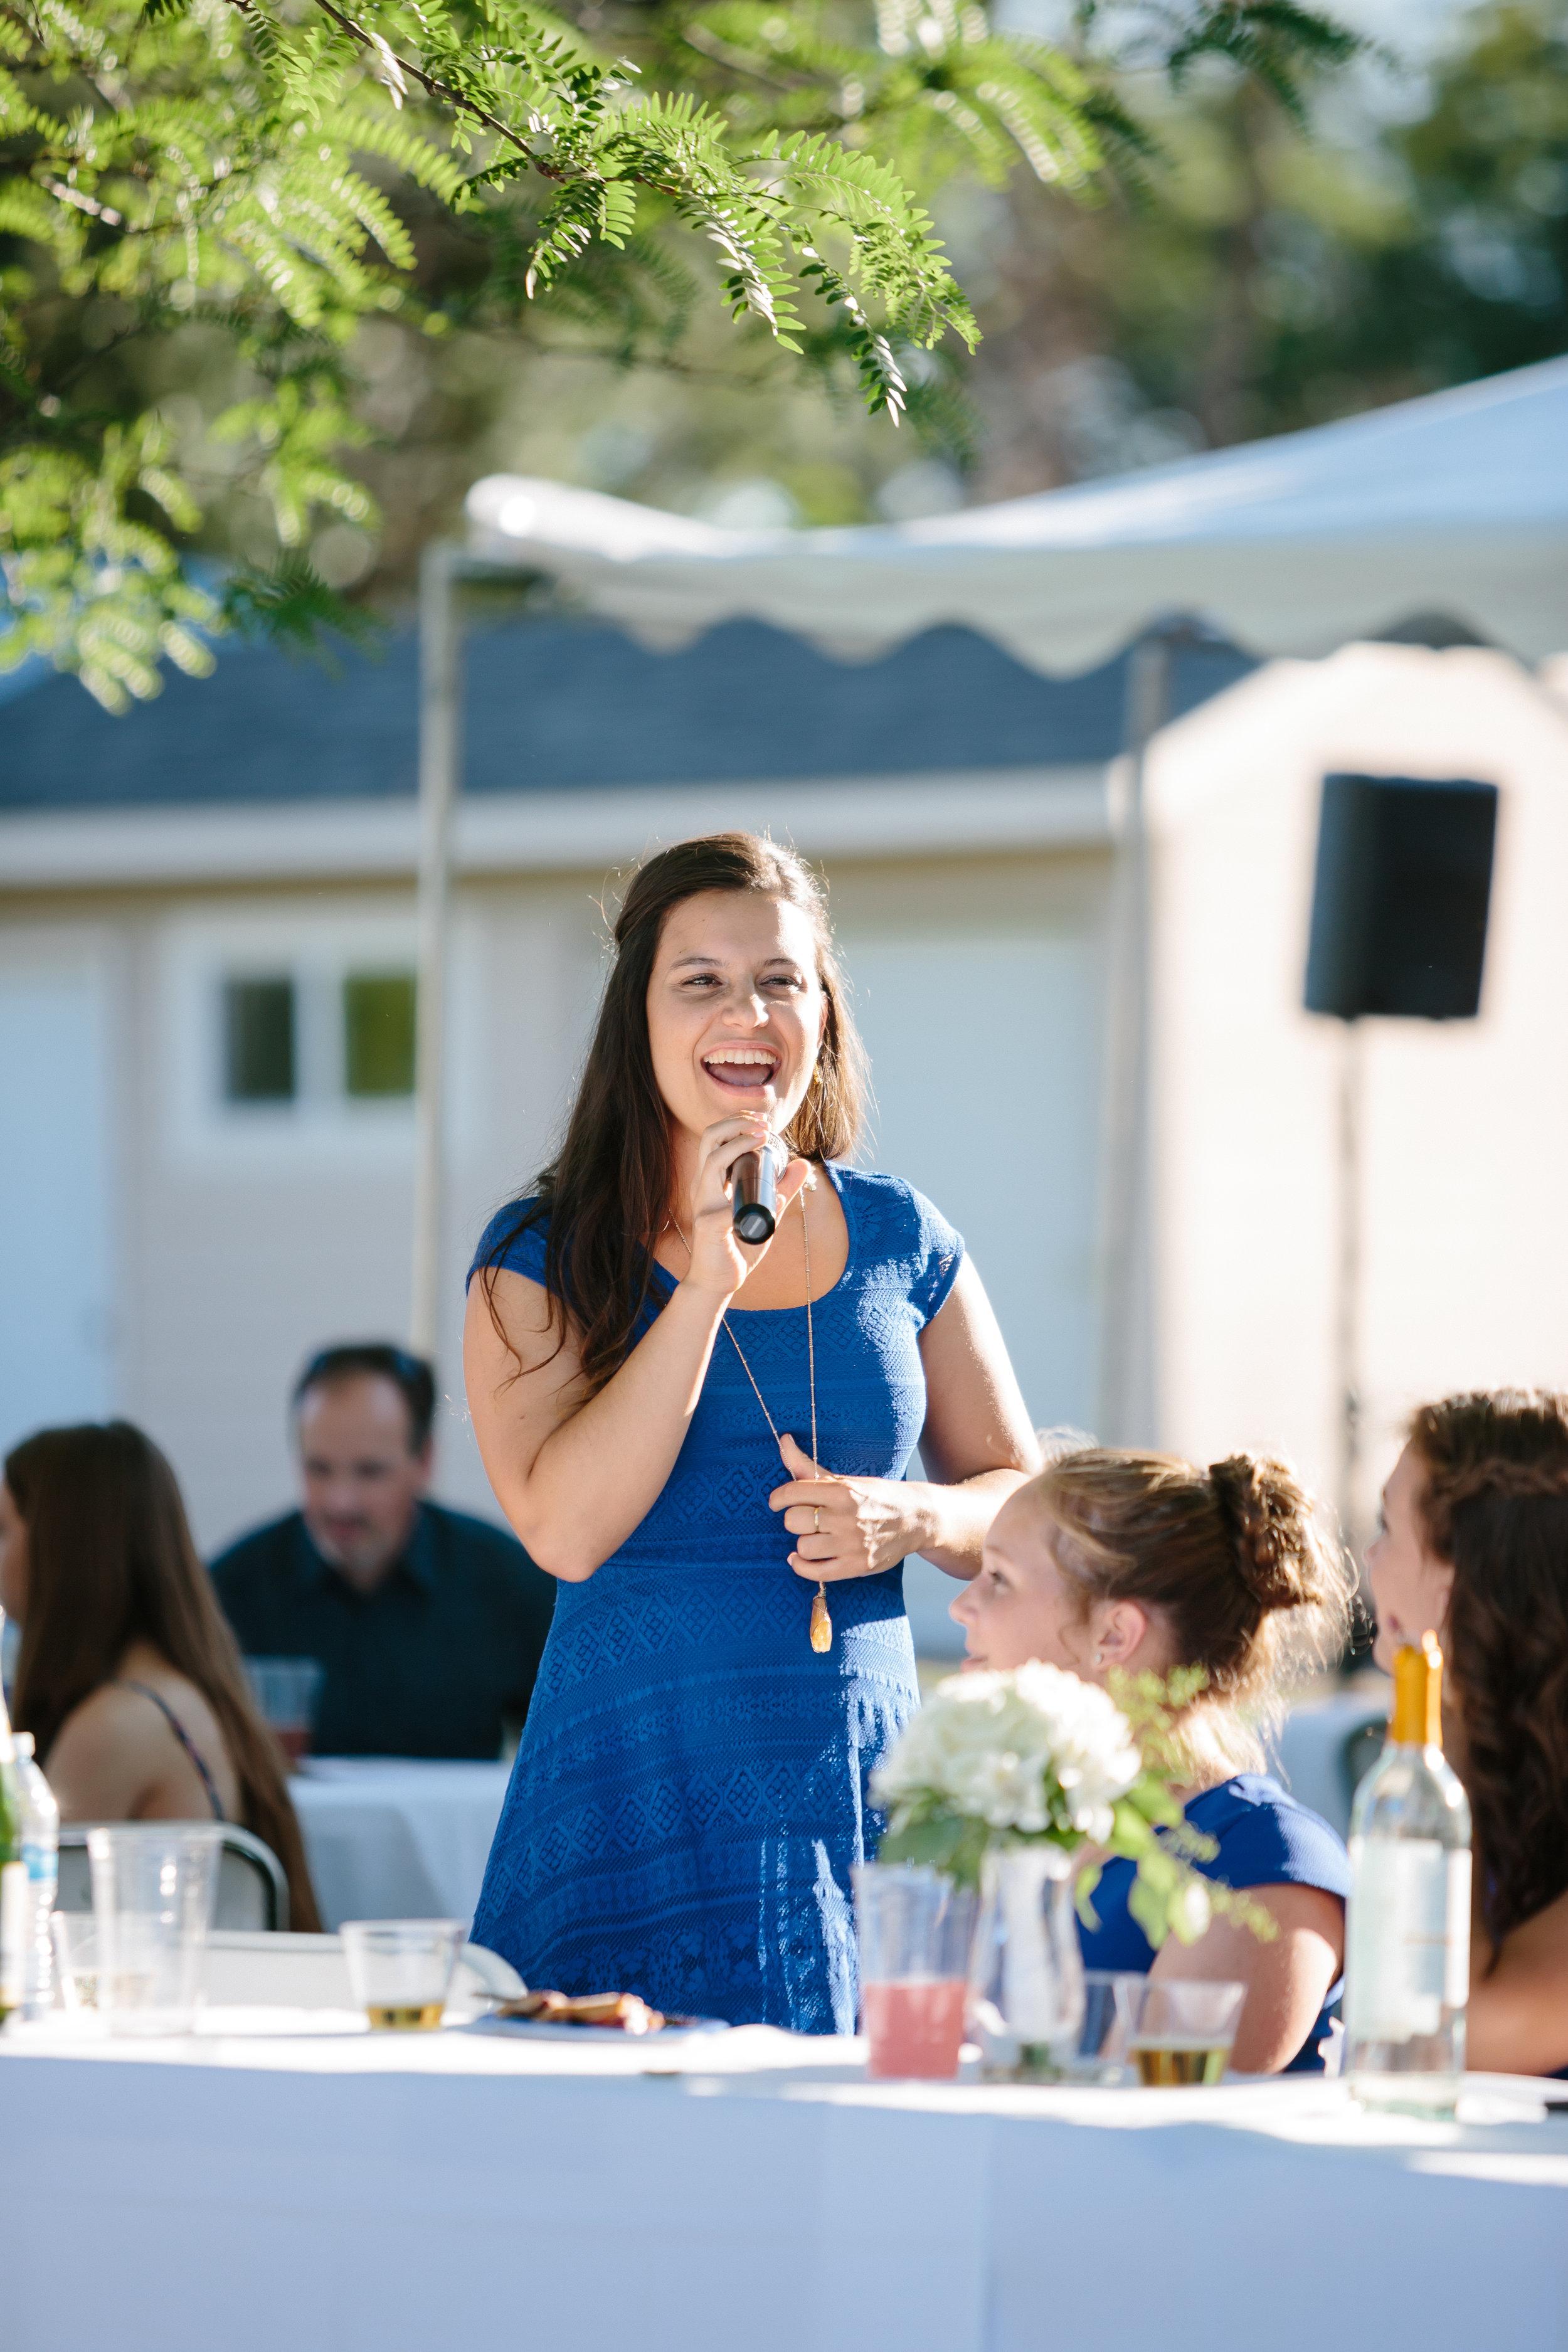 Jordan & Shantel Married - Idaho - Corrie Mick Photography-284.jpg